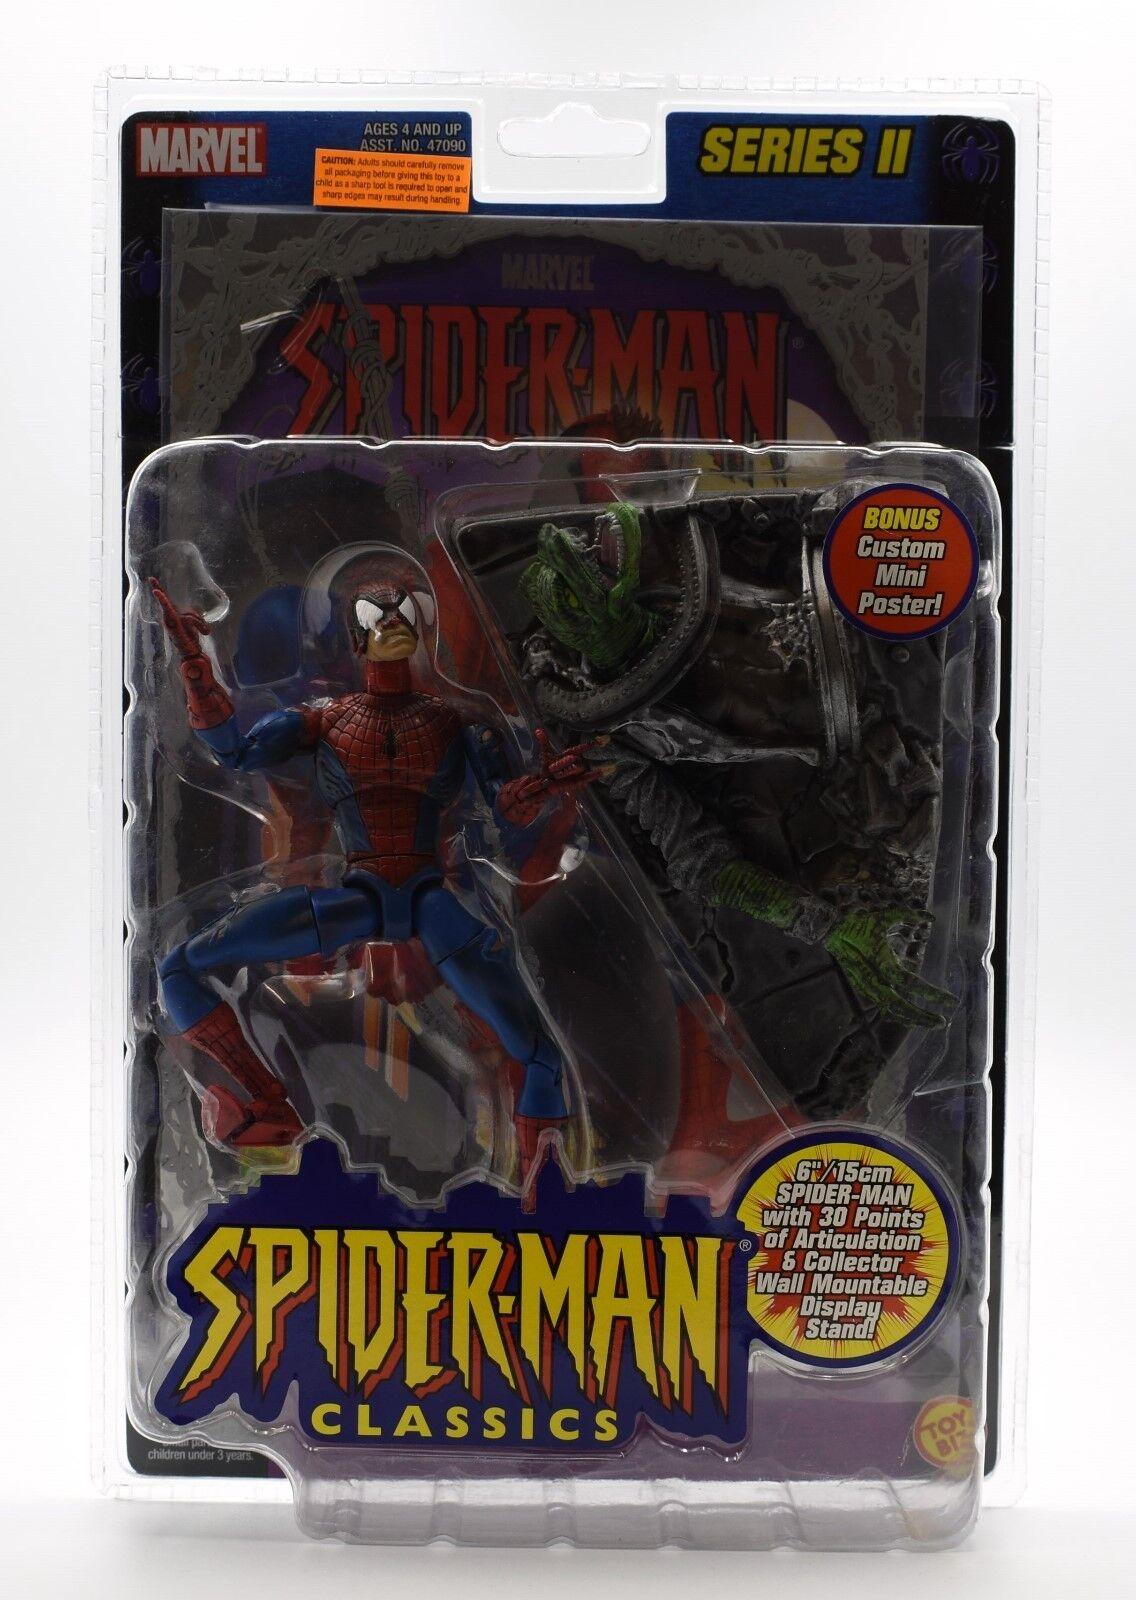 Spider-man Classics Series II (lámina) - Batalla devastado Hombre Araña Figura De Acción